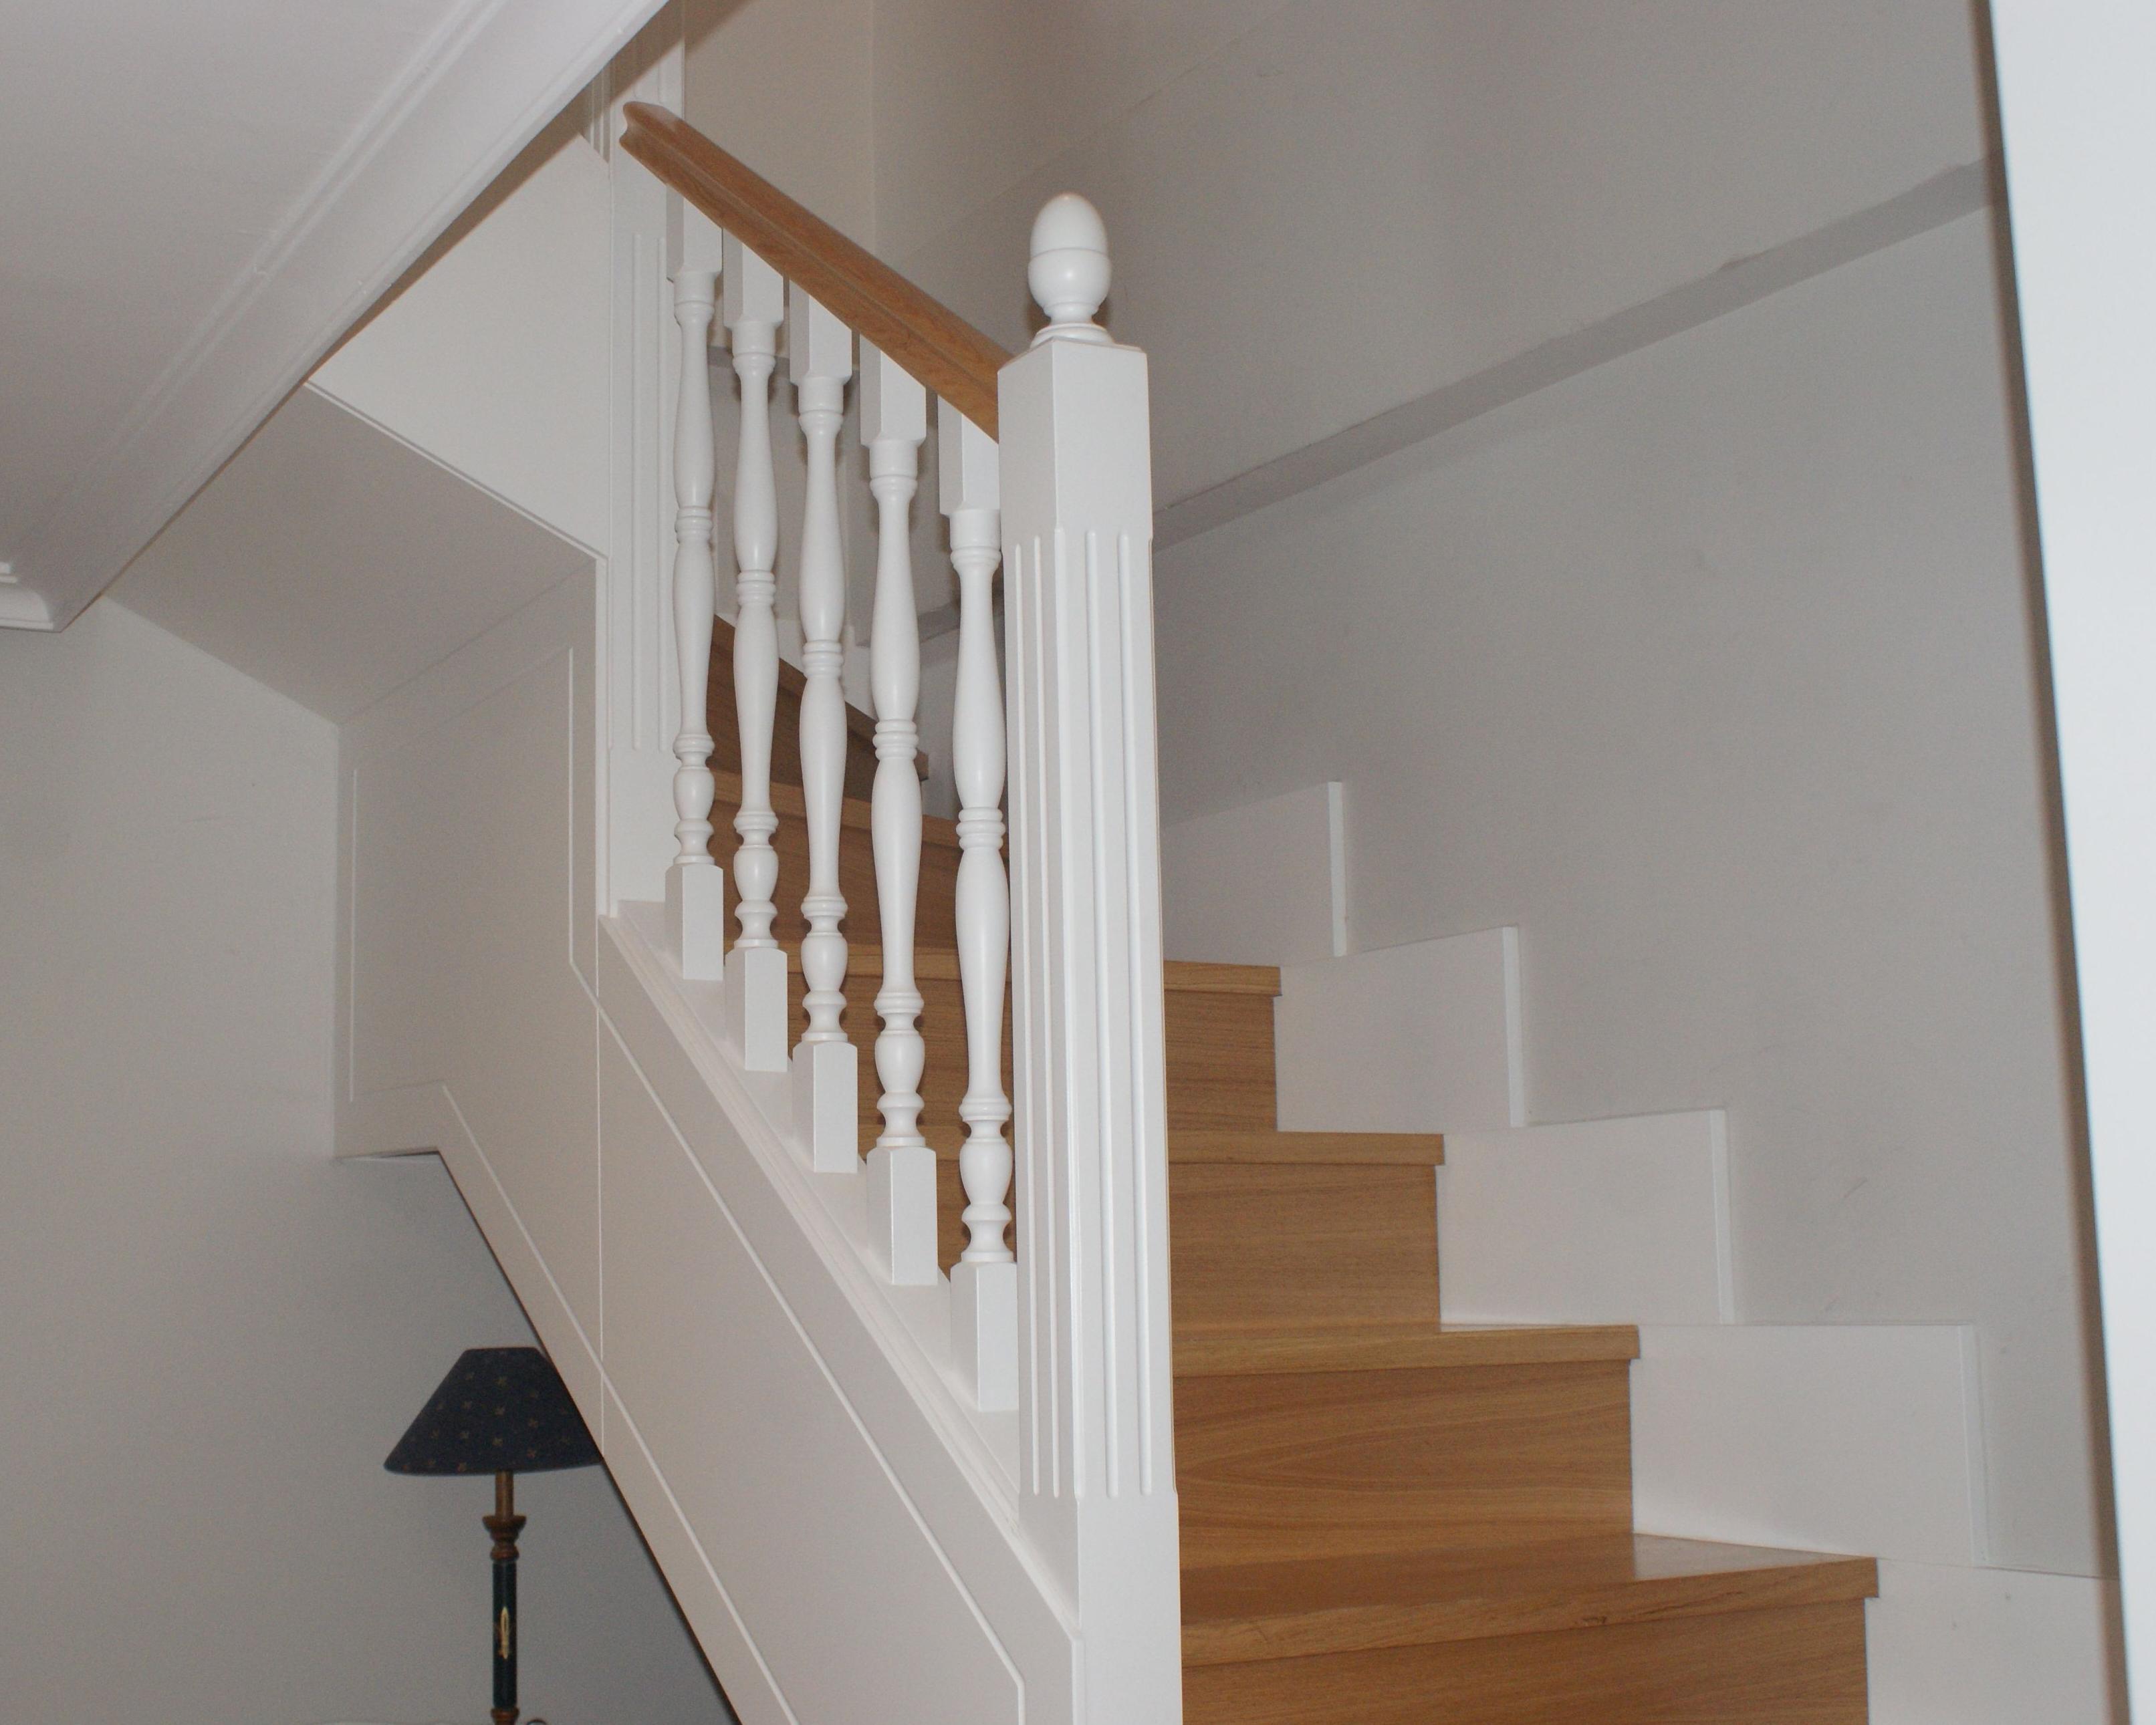 Escaleras de madera a medida lacadas cat logo de - Maderas para escaleras ...